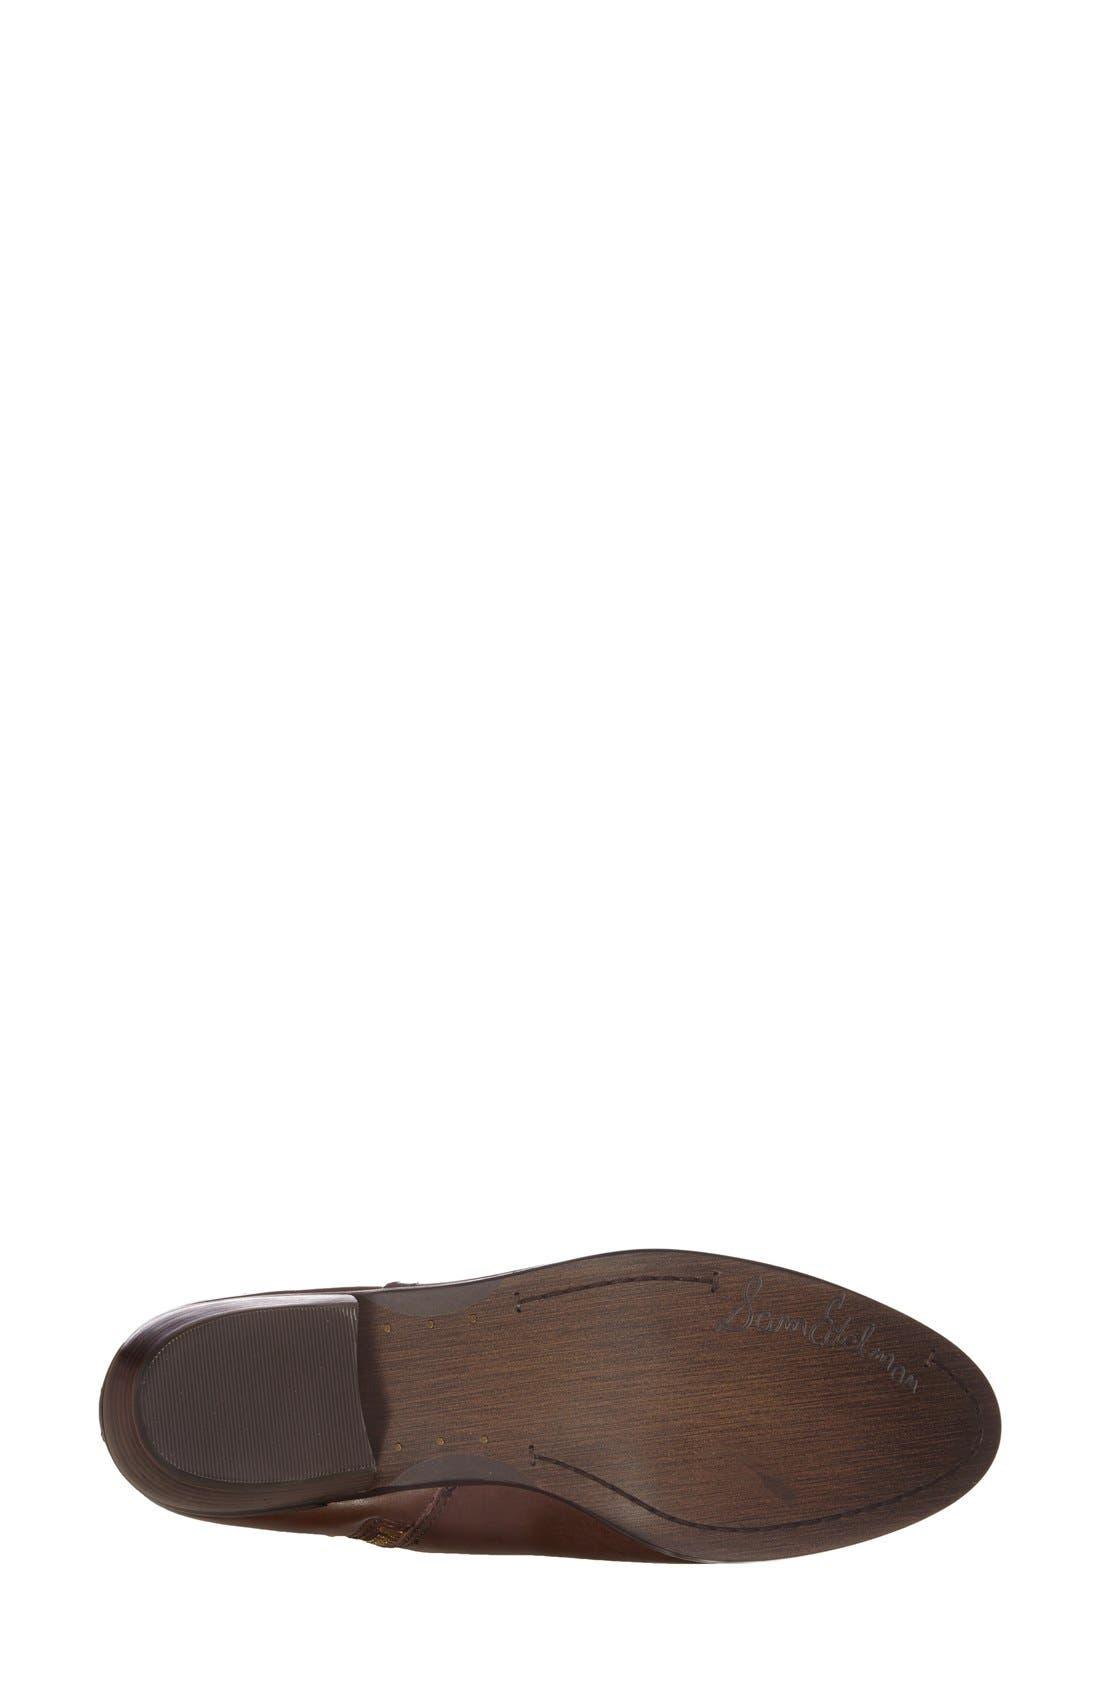 Alternate Image 4  - Sam Edelman 'Peter' Leather Bootie (Women)